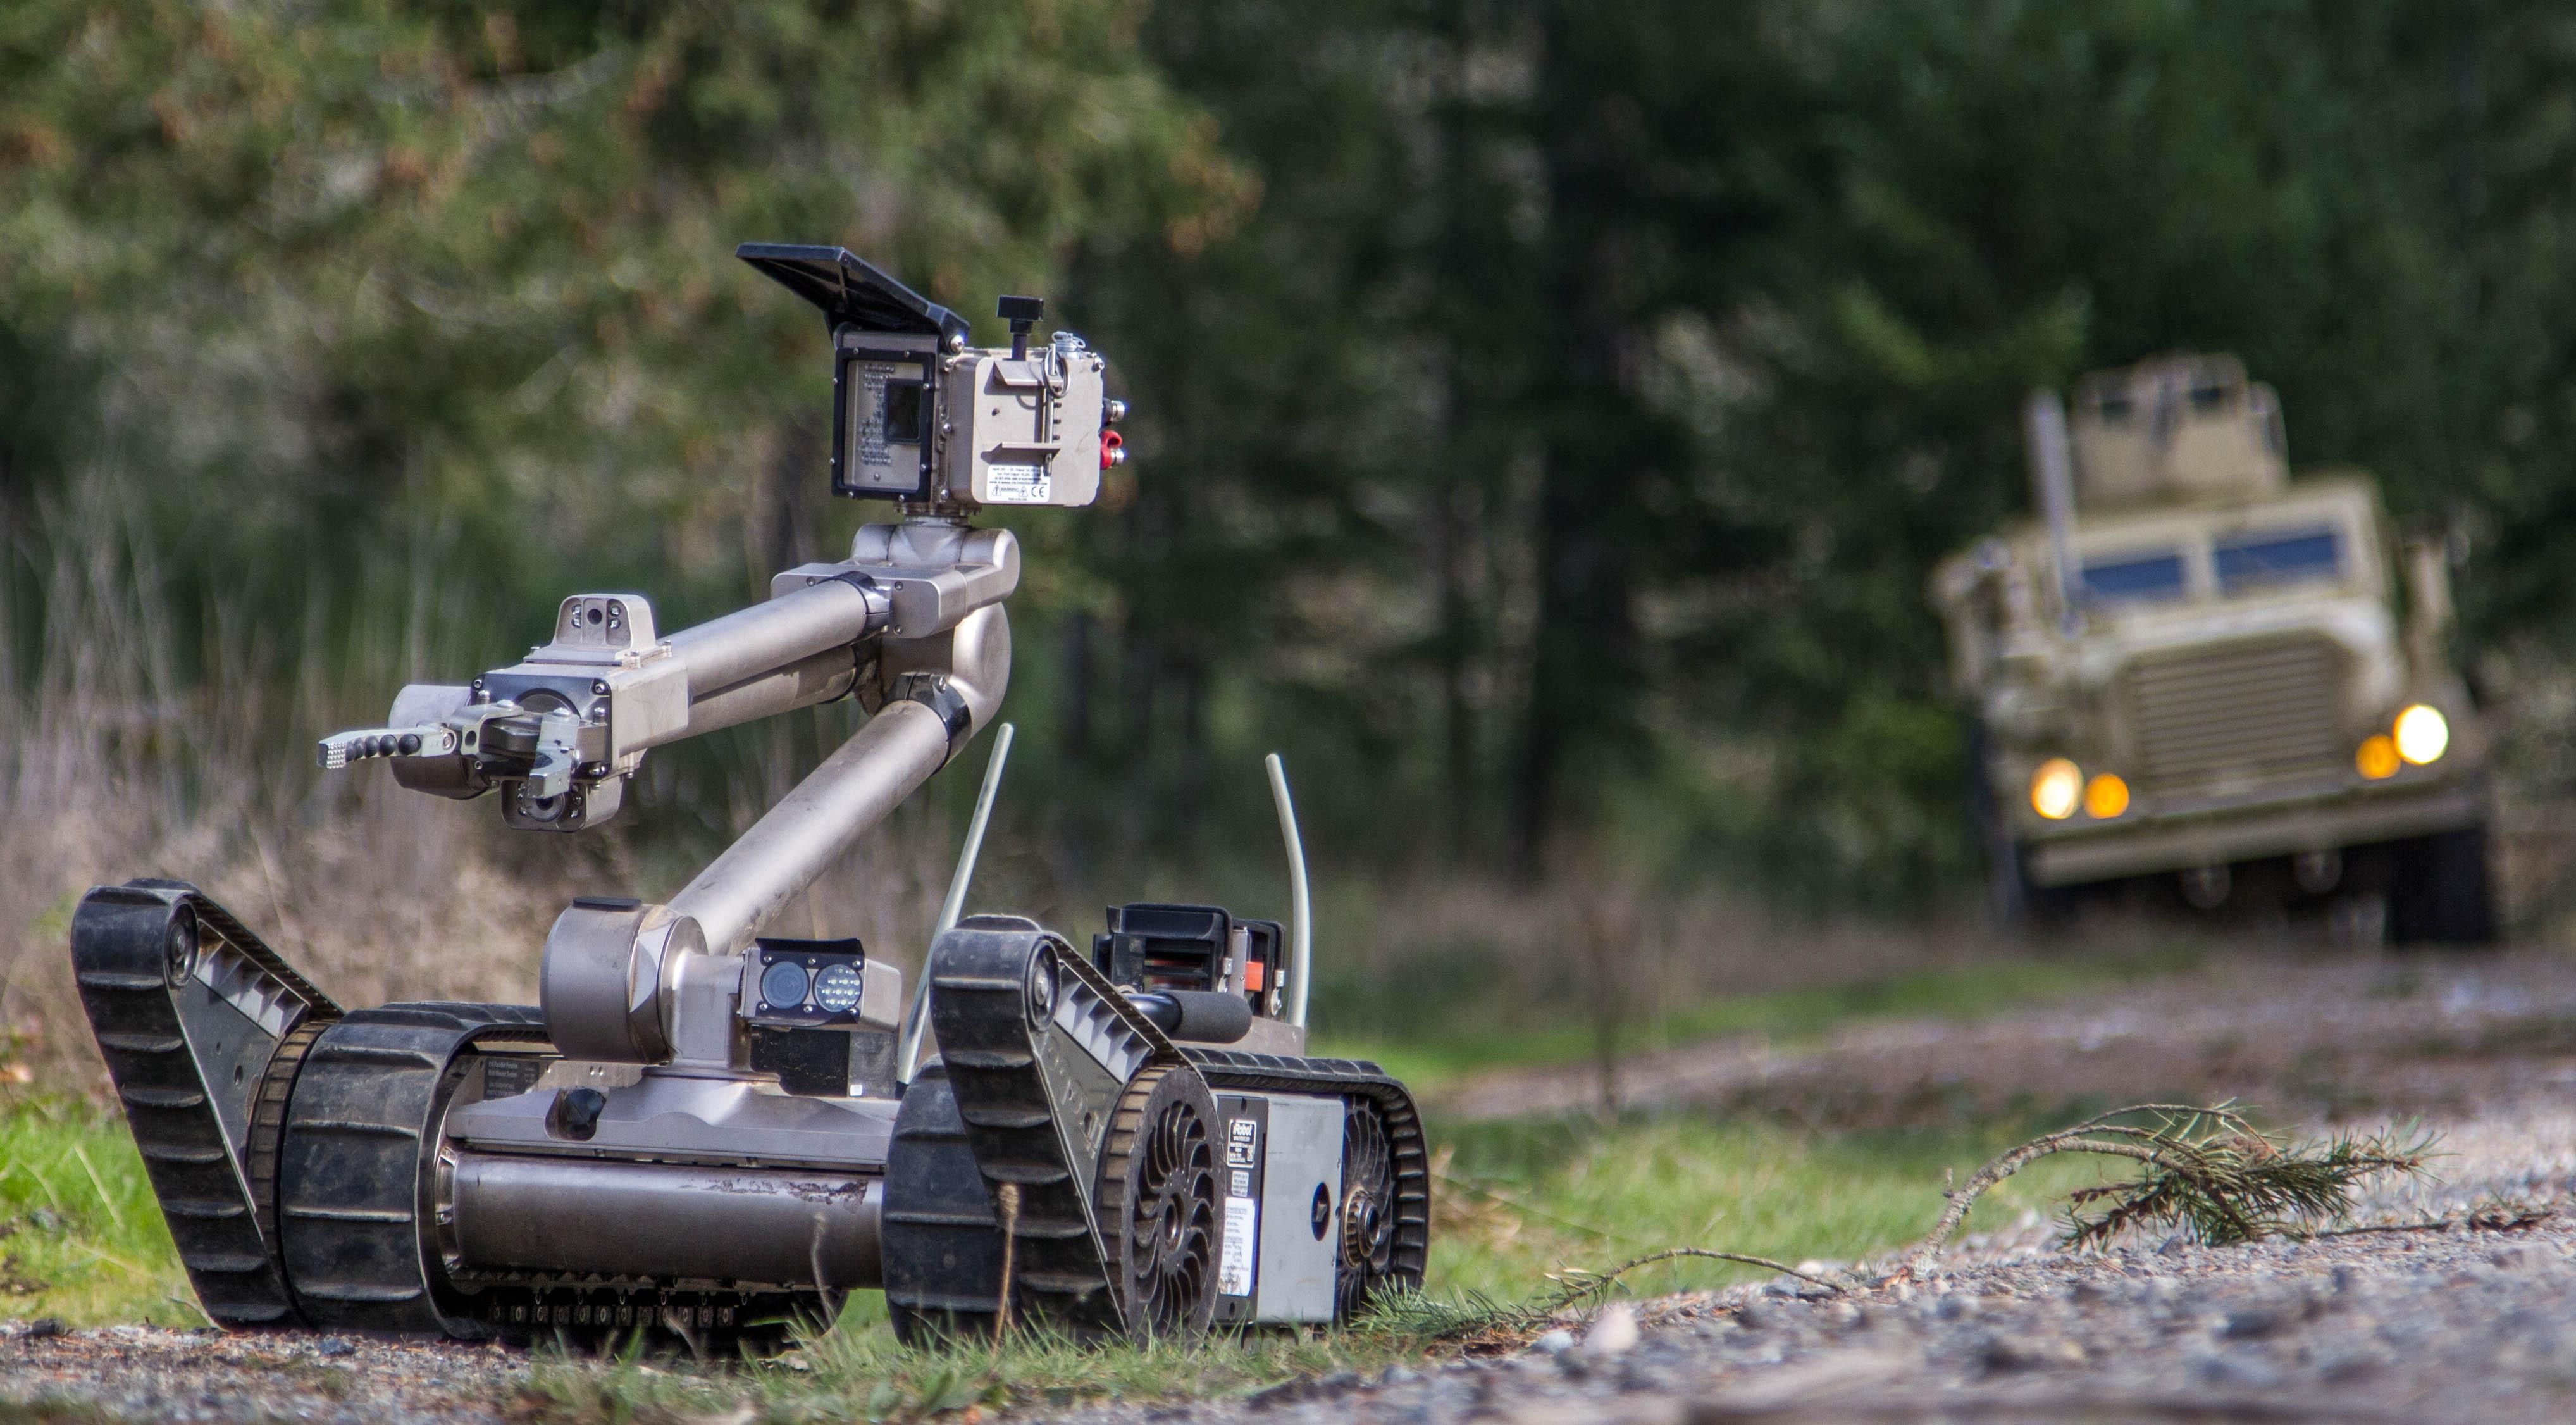 Robot Wars 2016